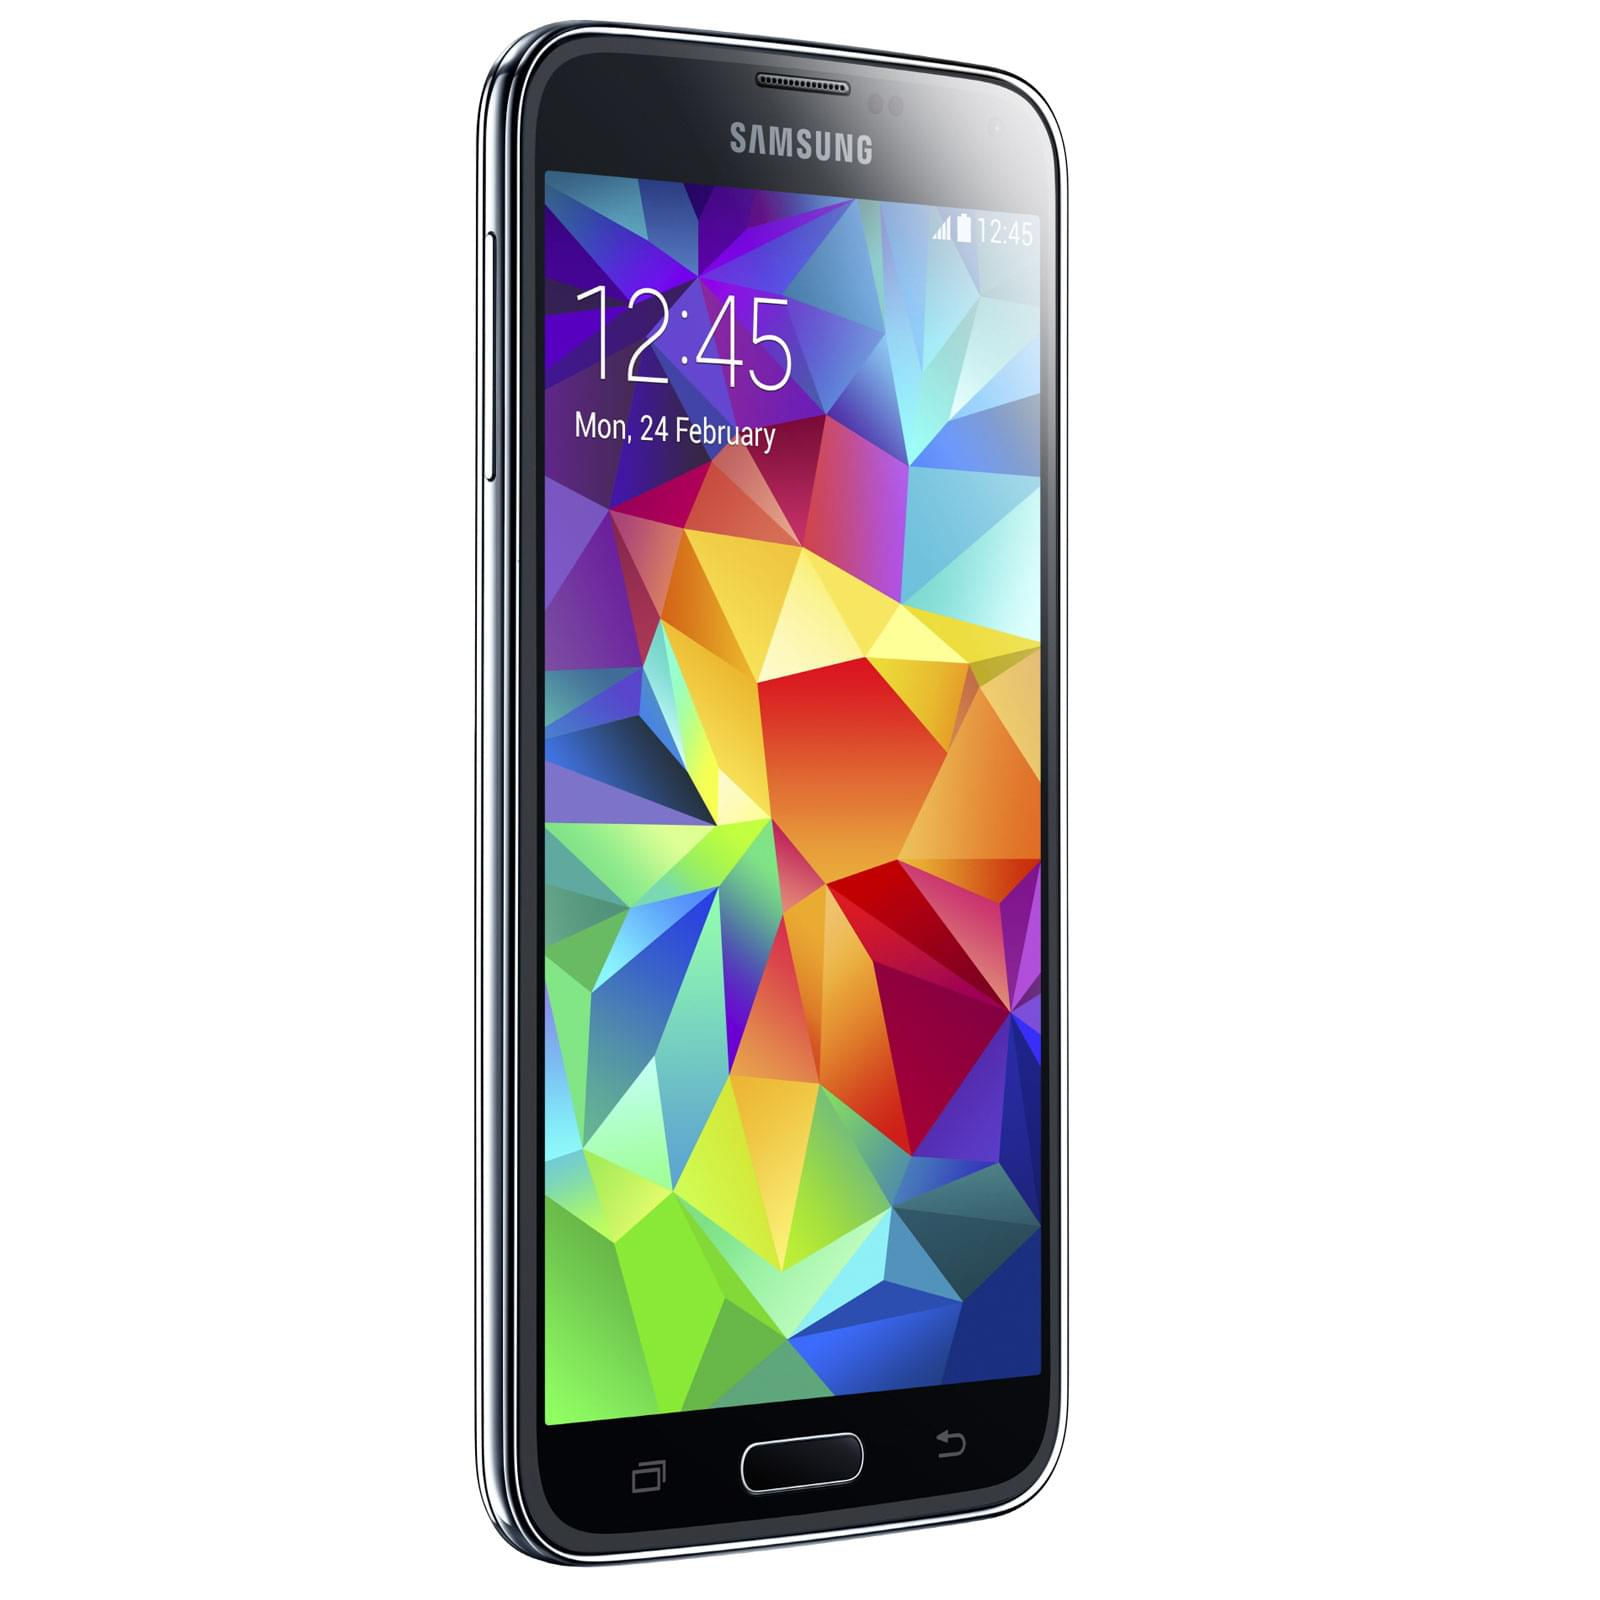 Samsung Galaxy S5 16Go Bleu G900F (SM-G900FZBAXEF) - Achat / Vente Téléphonie sur Cybertek.fr - 0